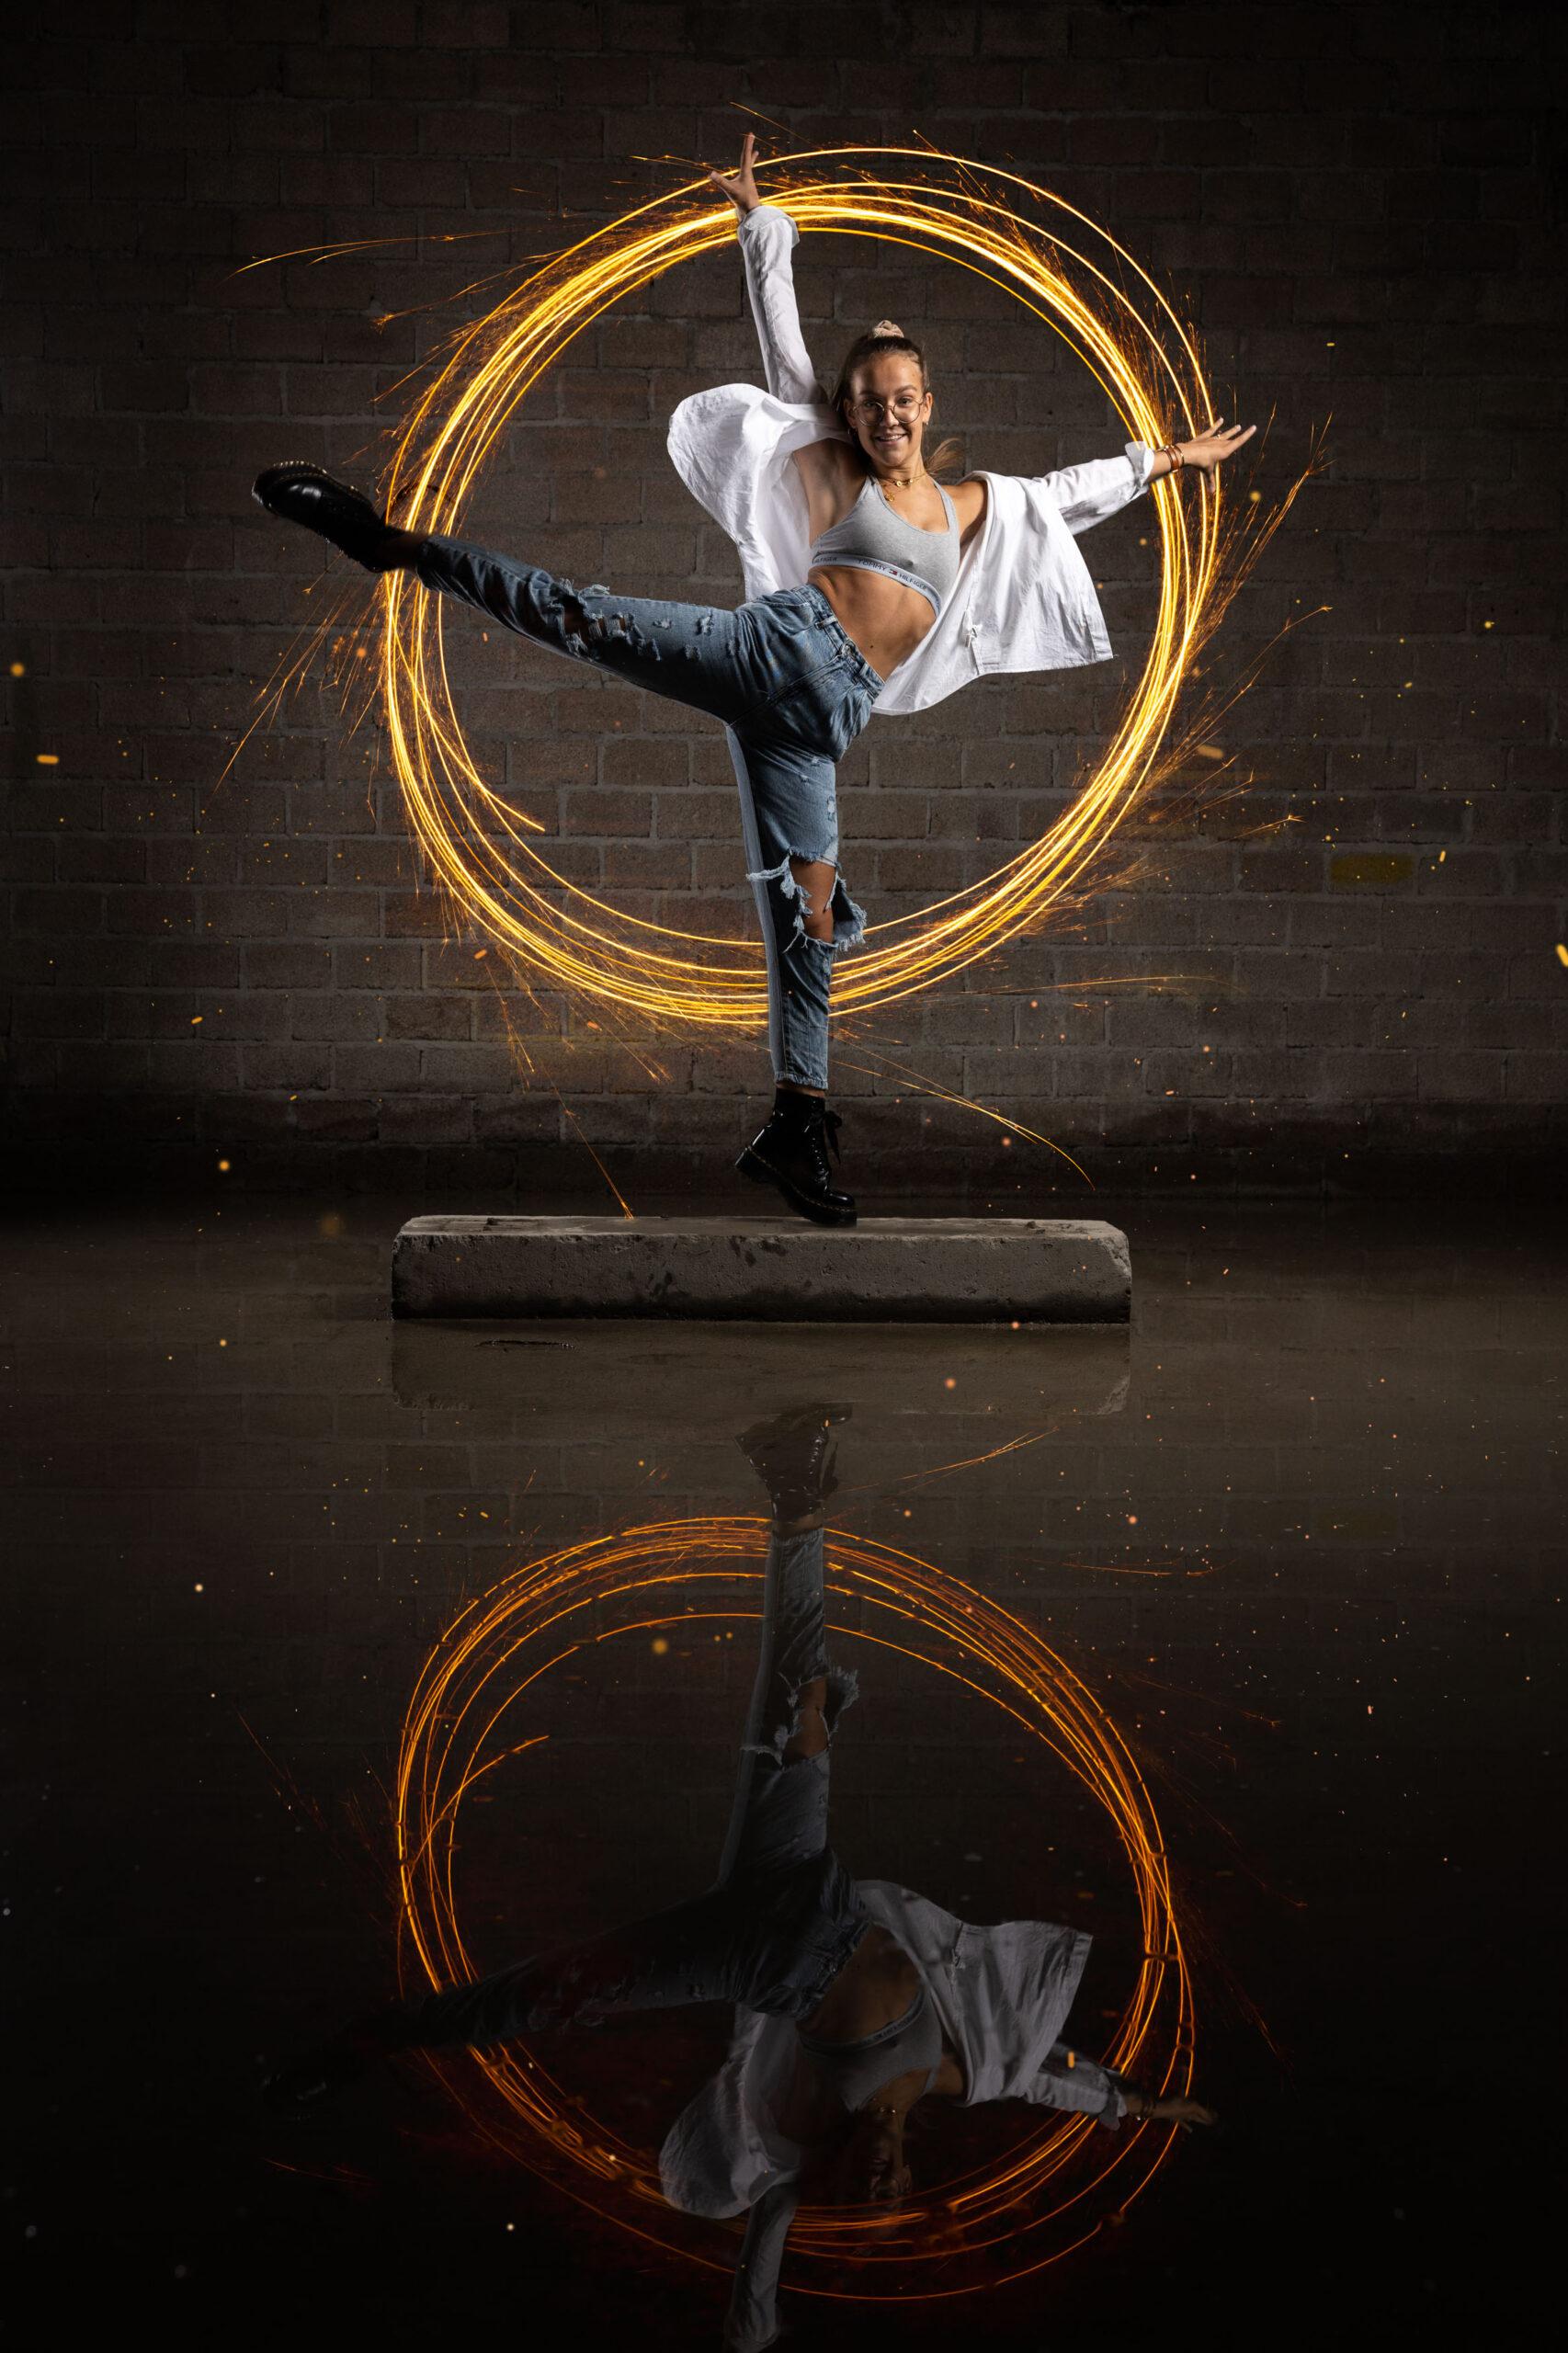 Meier & Kamer: Dance Fotoshooting im verlassenen Industriegebäude mit Lightpaintig